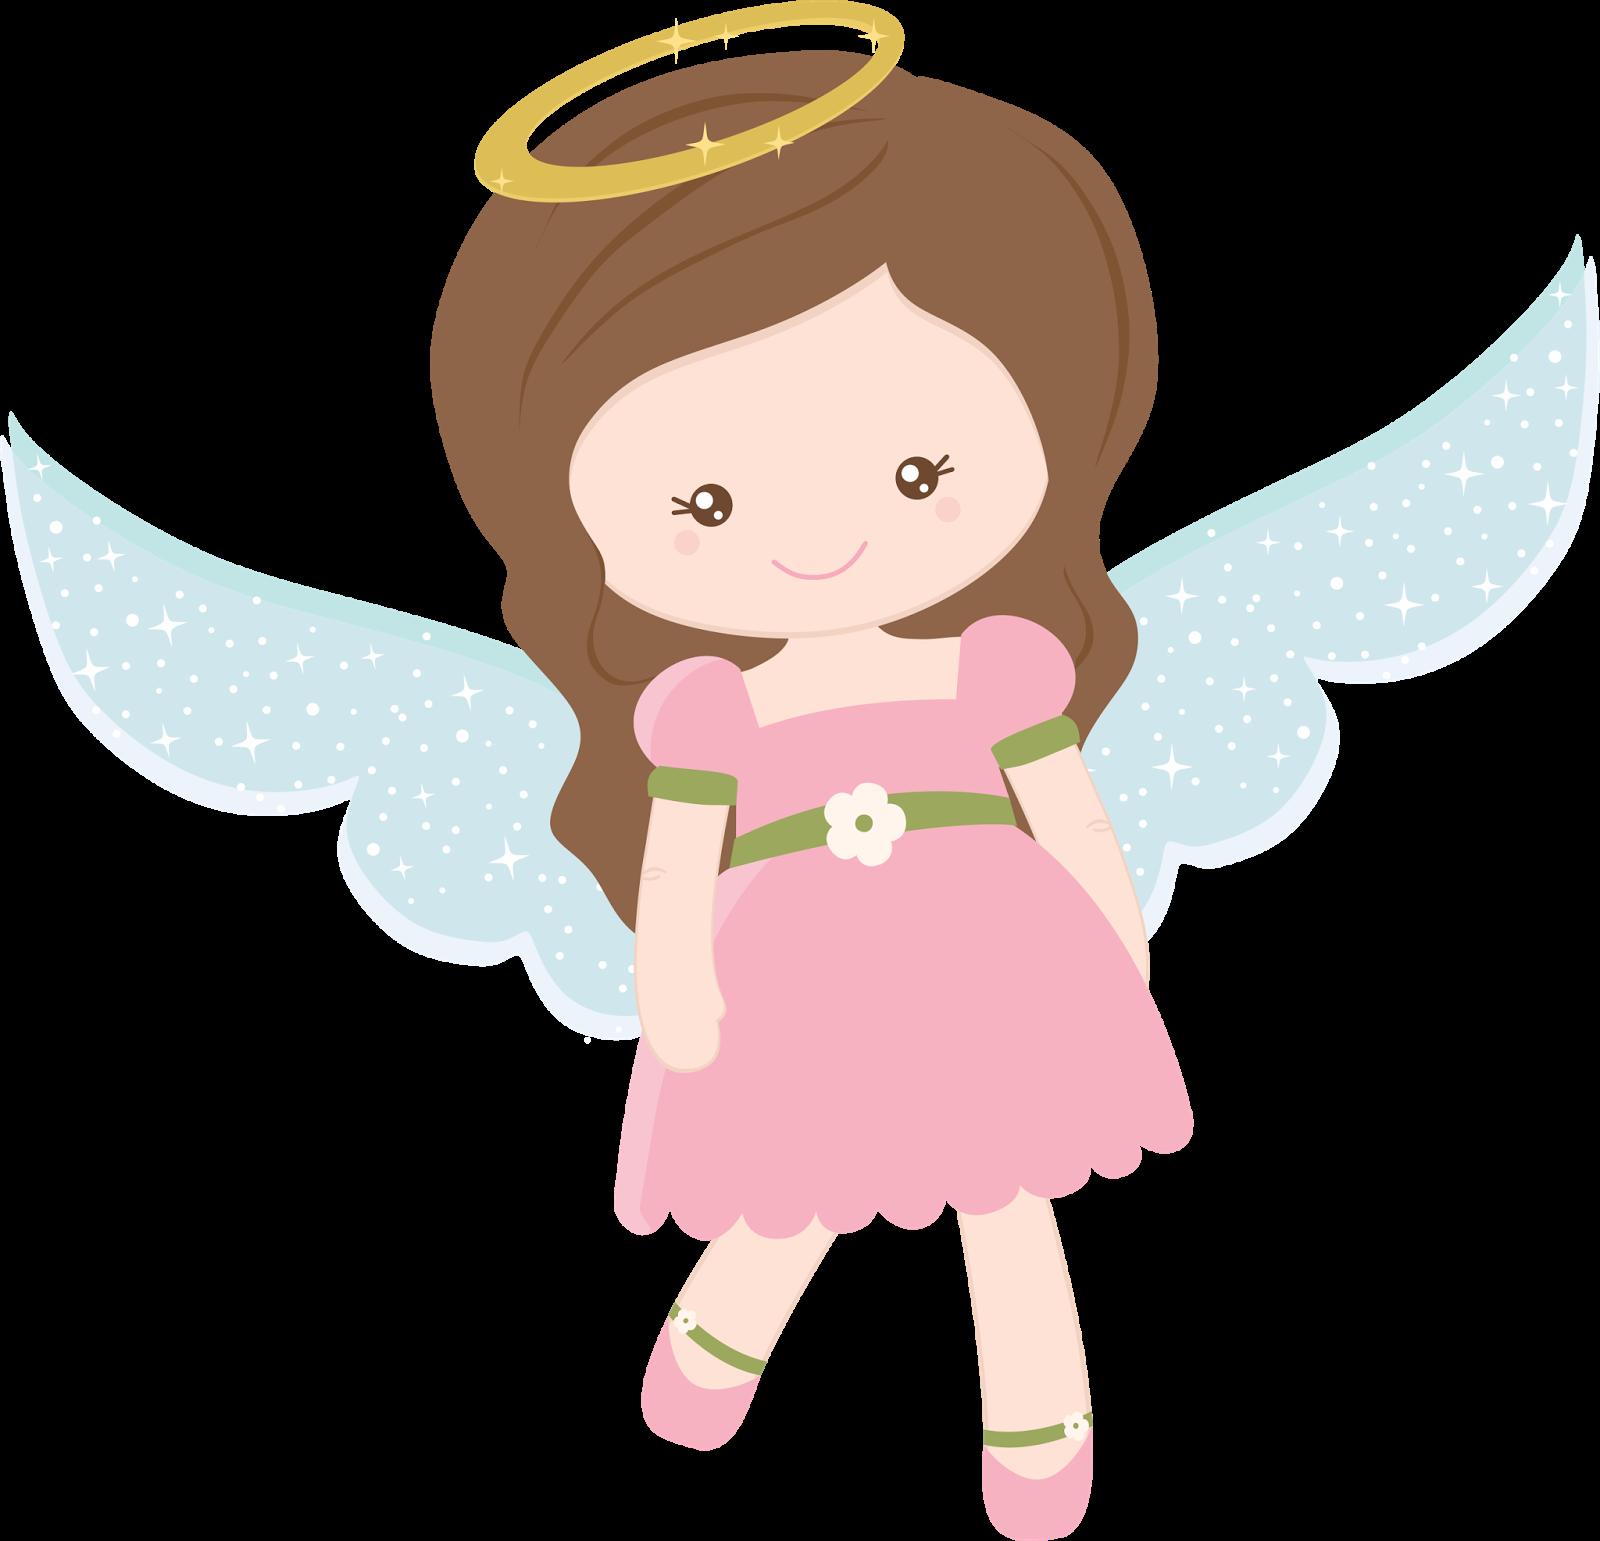 pin de 5511985396859 em batizado pinterest anjo png batismo e anjos